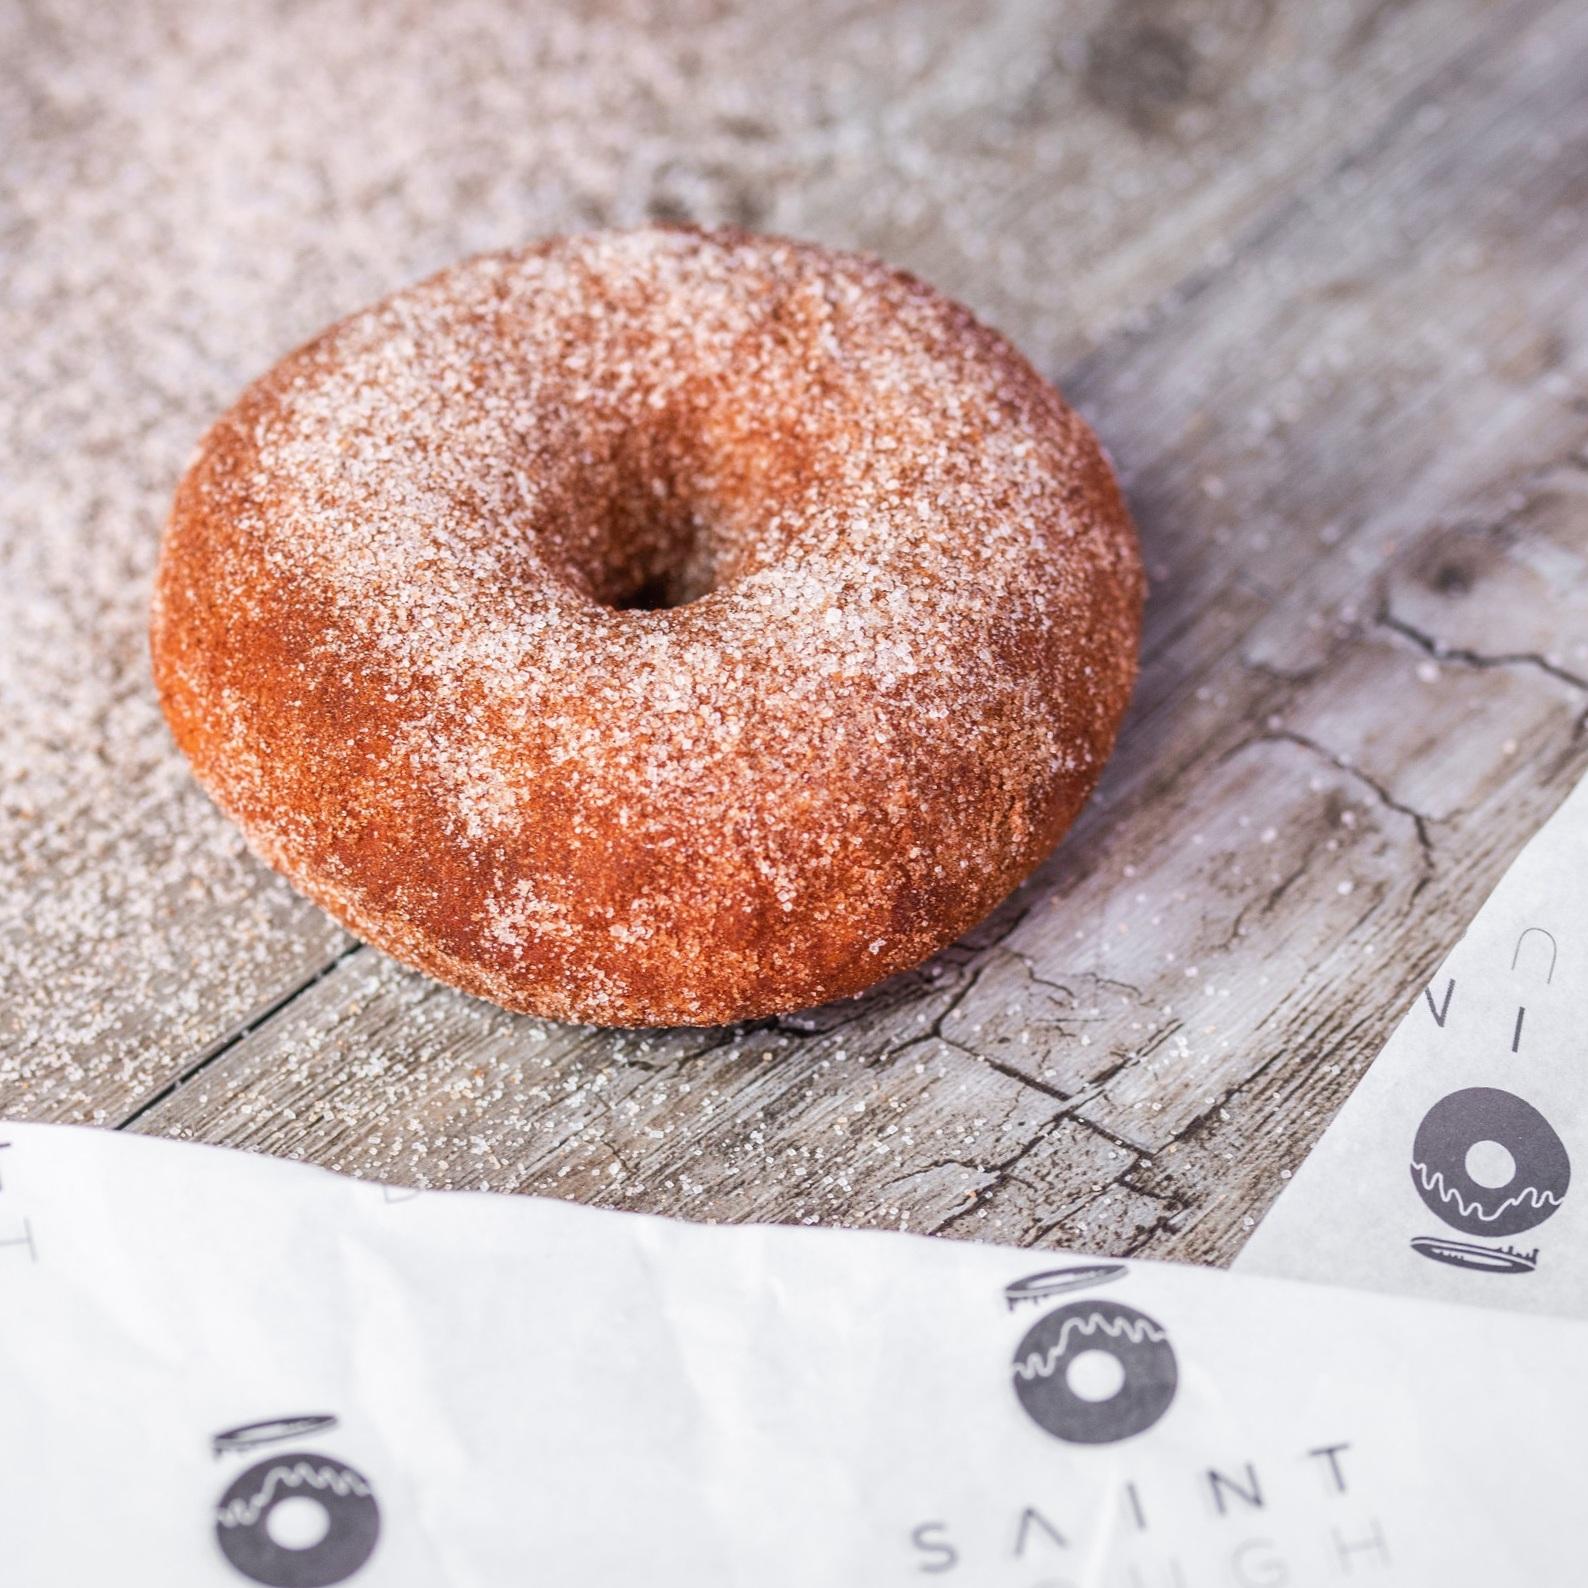 Cinnamon Sugar Ring - Fresh Cinnamon Sourdough covered in Cinnamon and Sugar.*Allergen advice